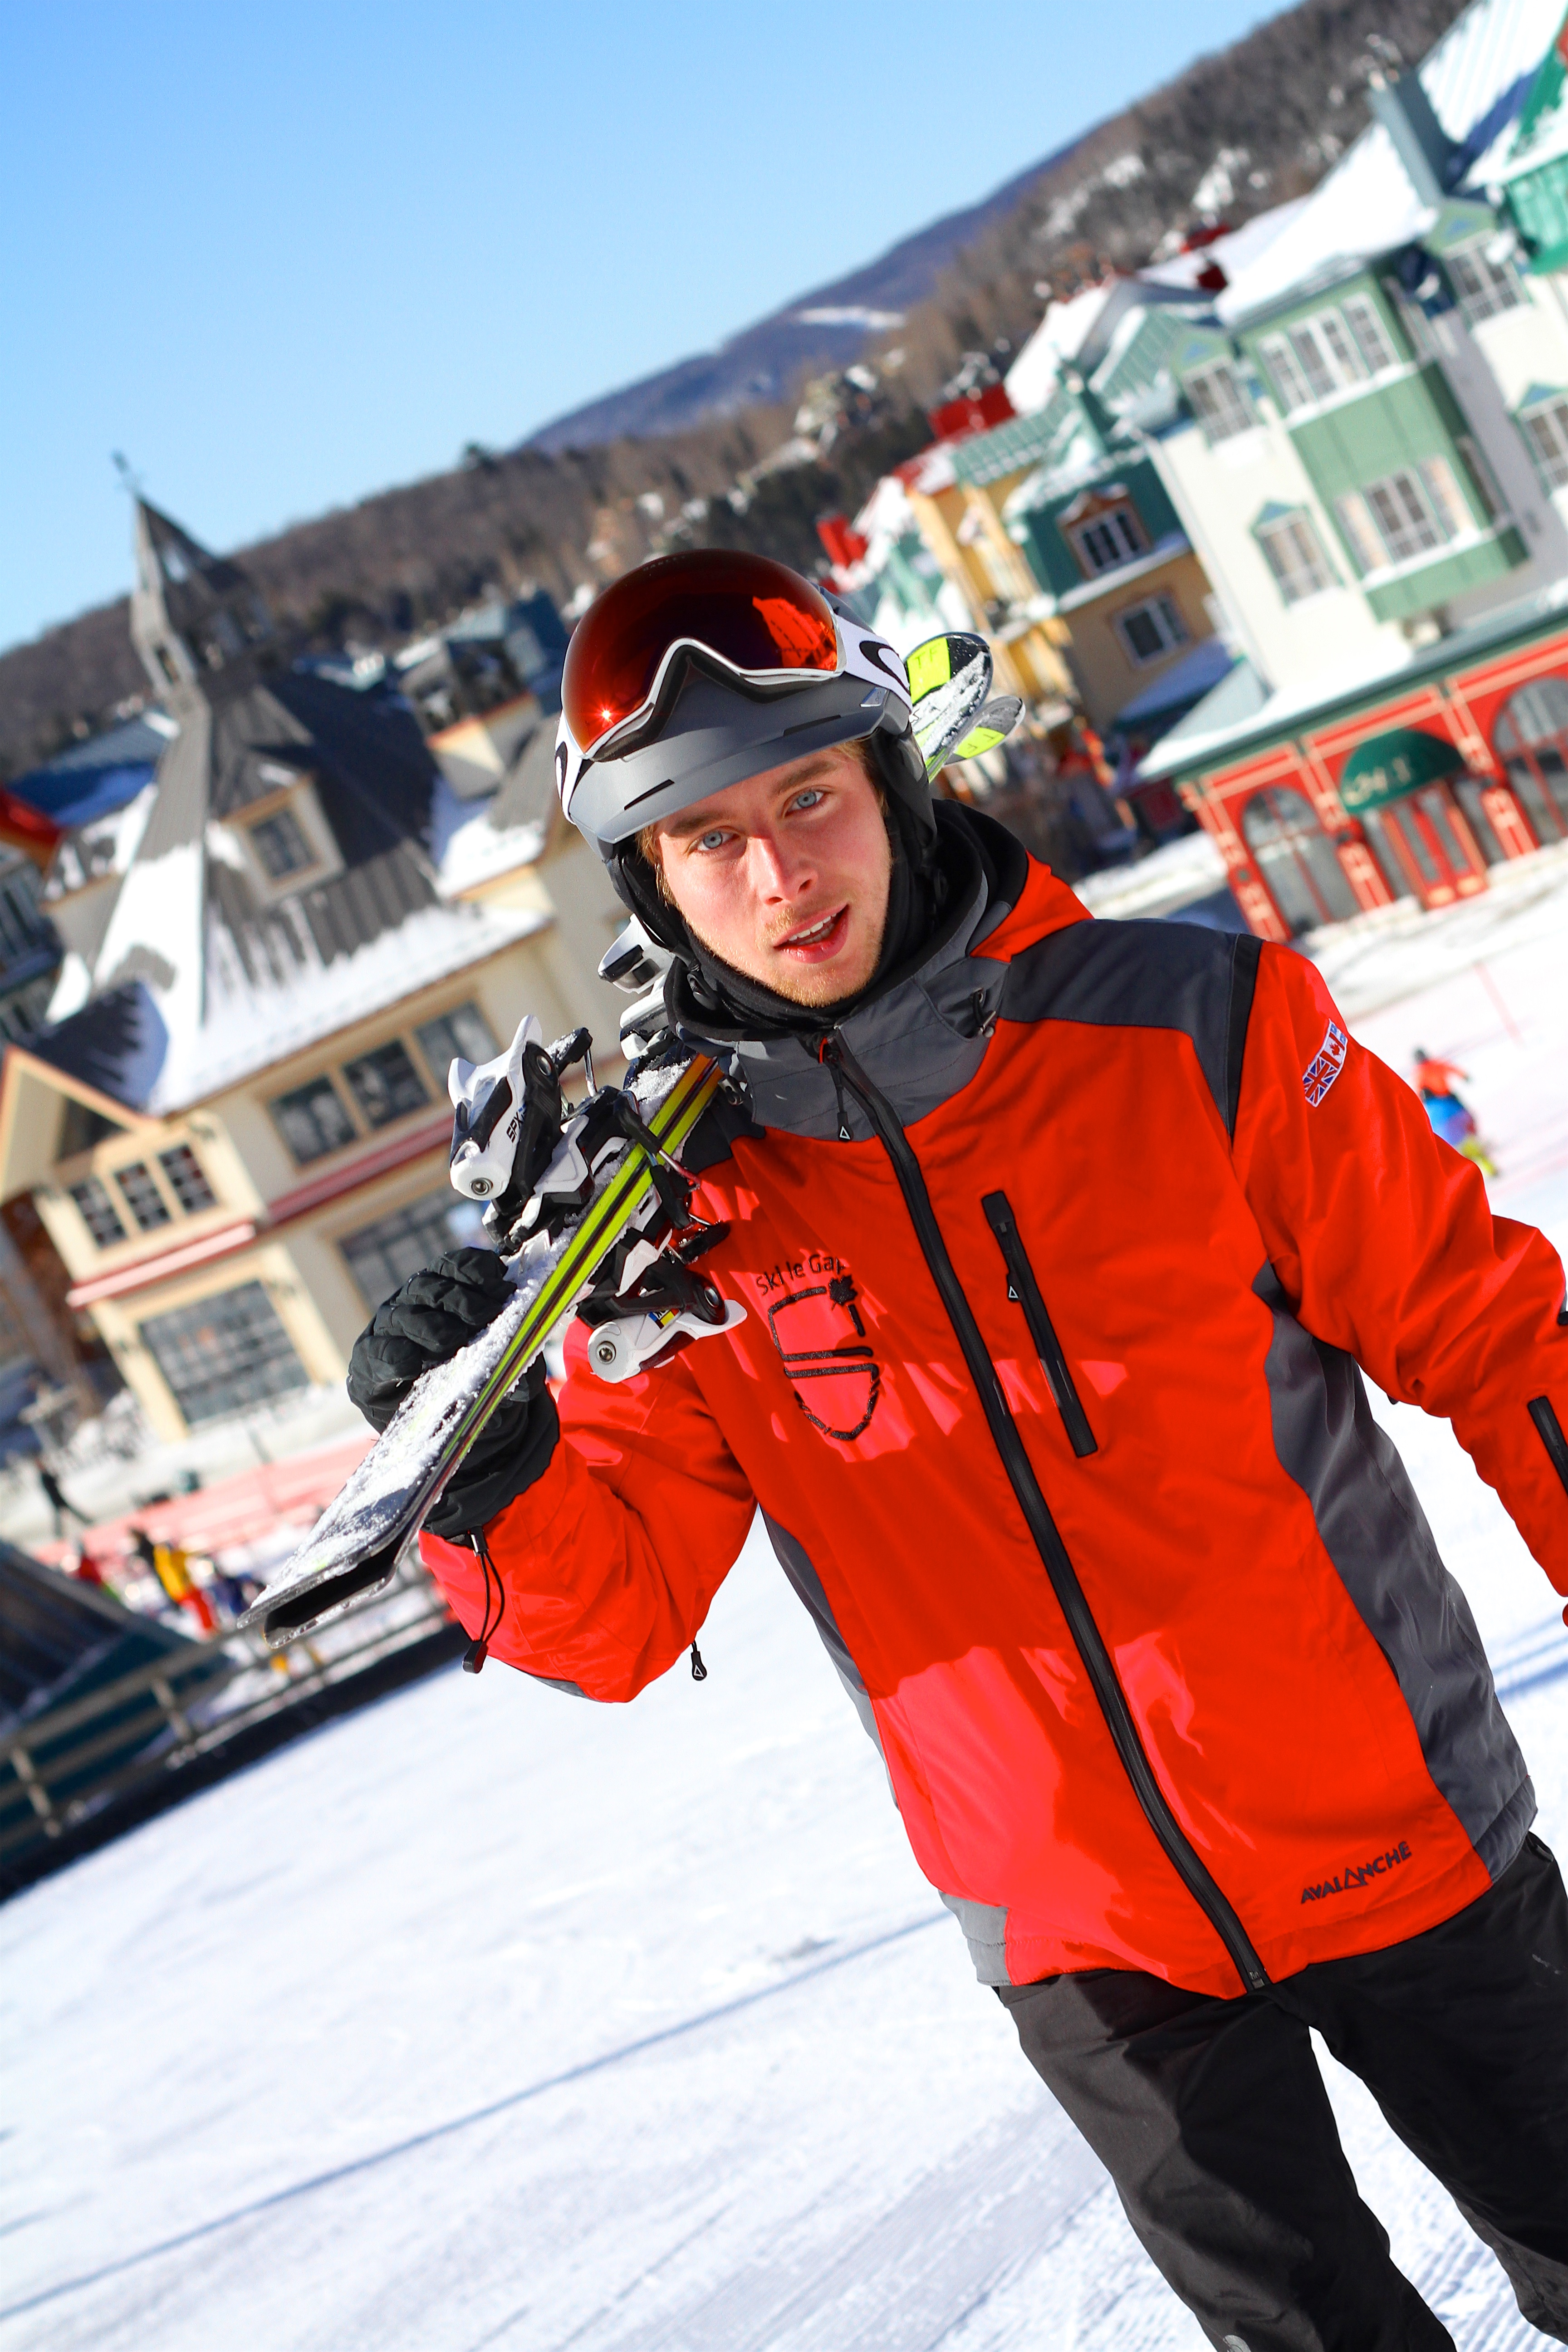 Ski le Gap: Intensive Ski Training